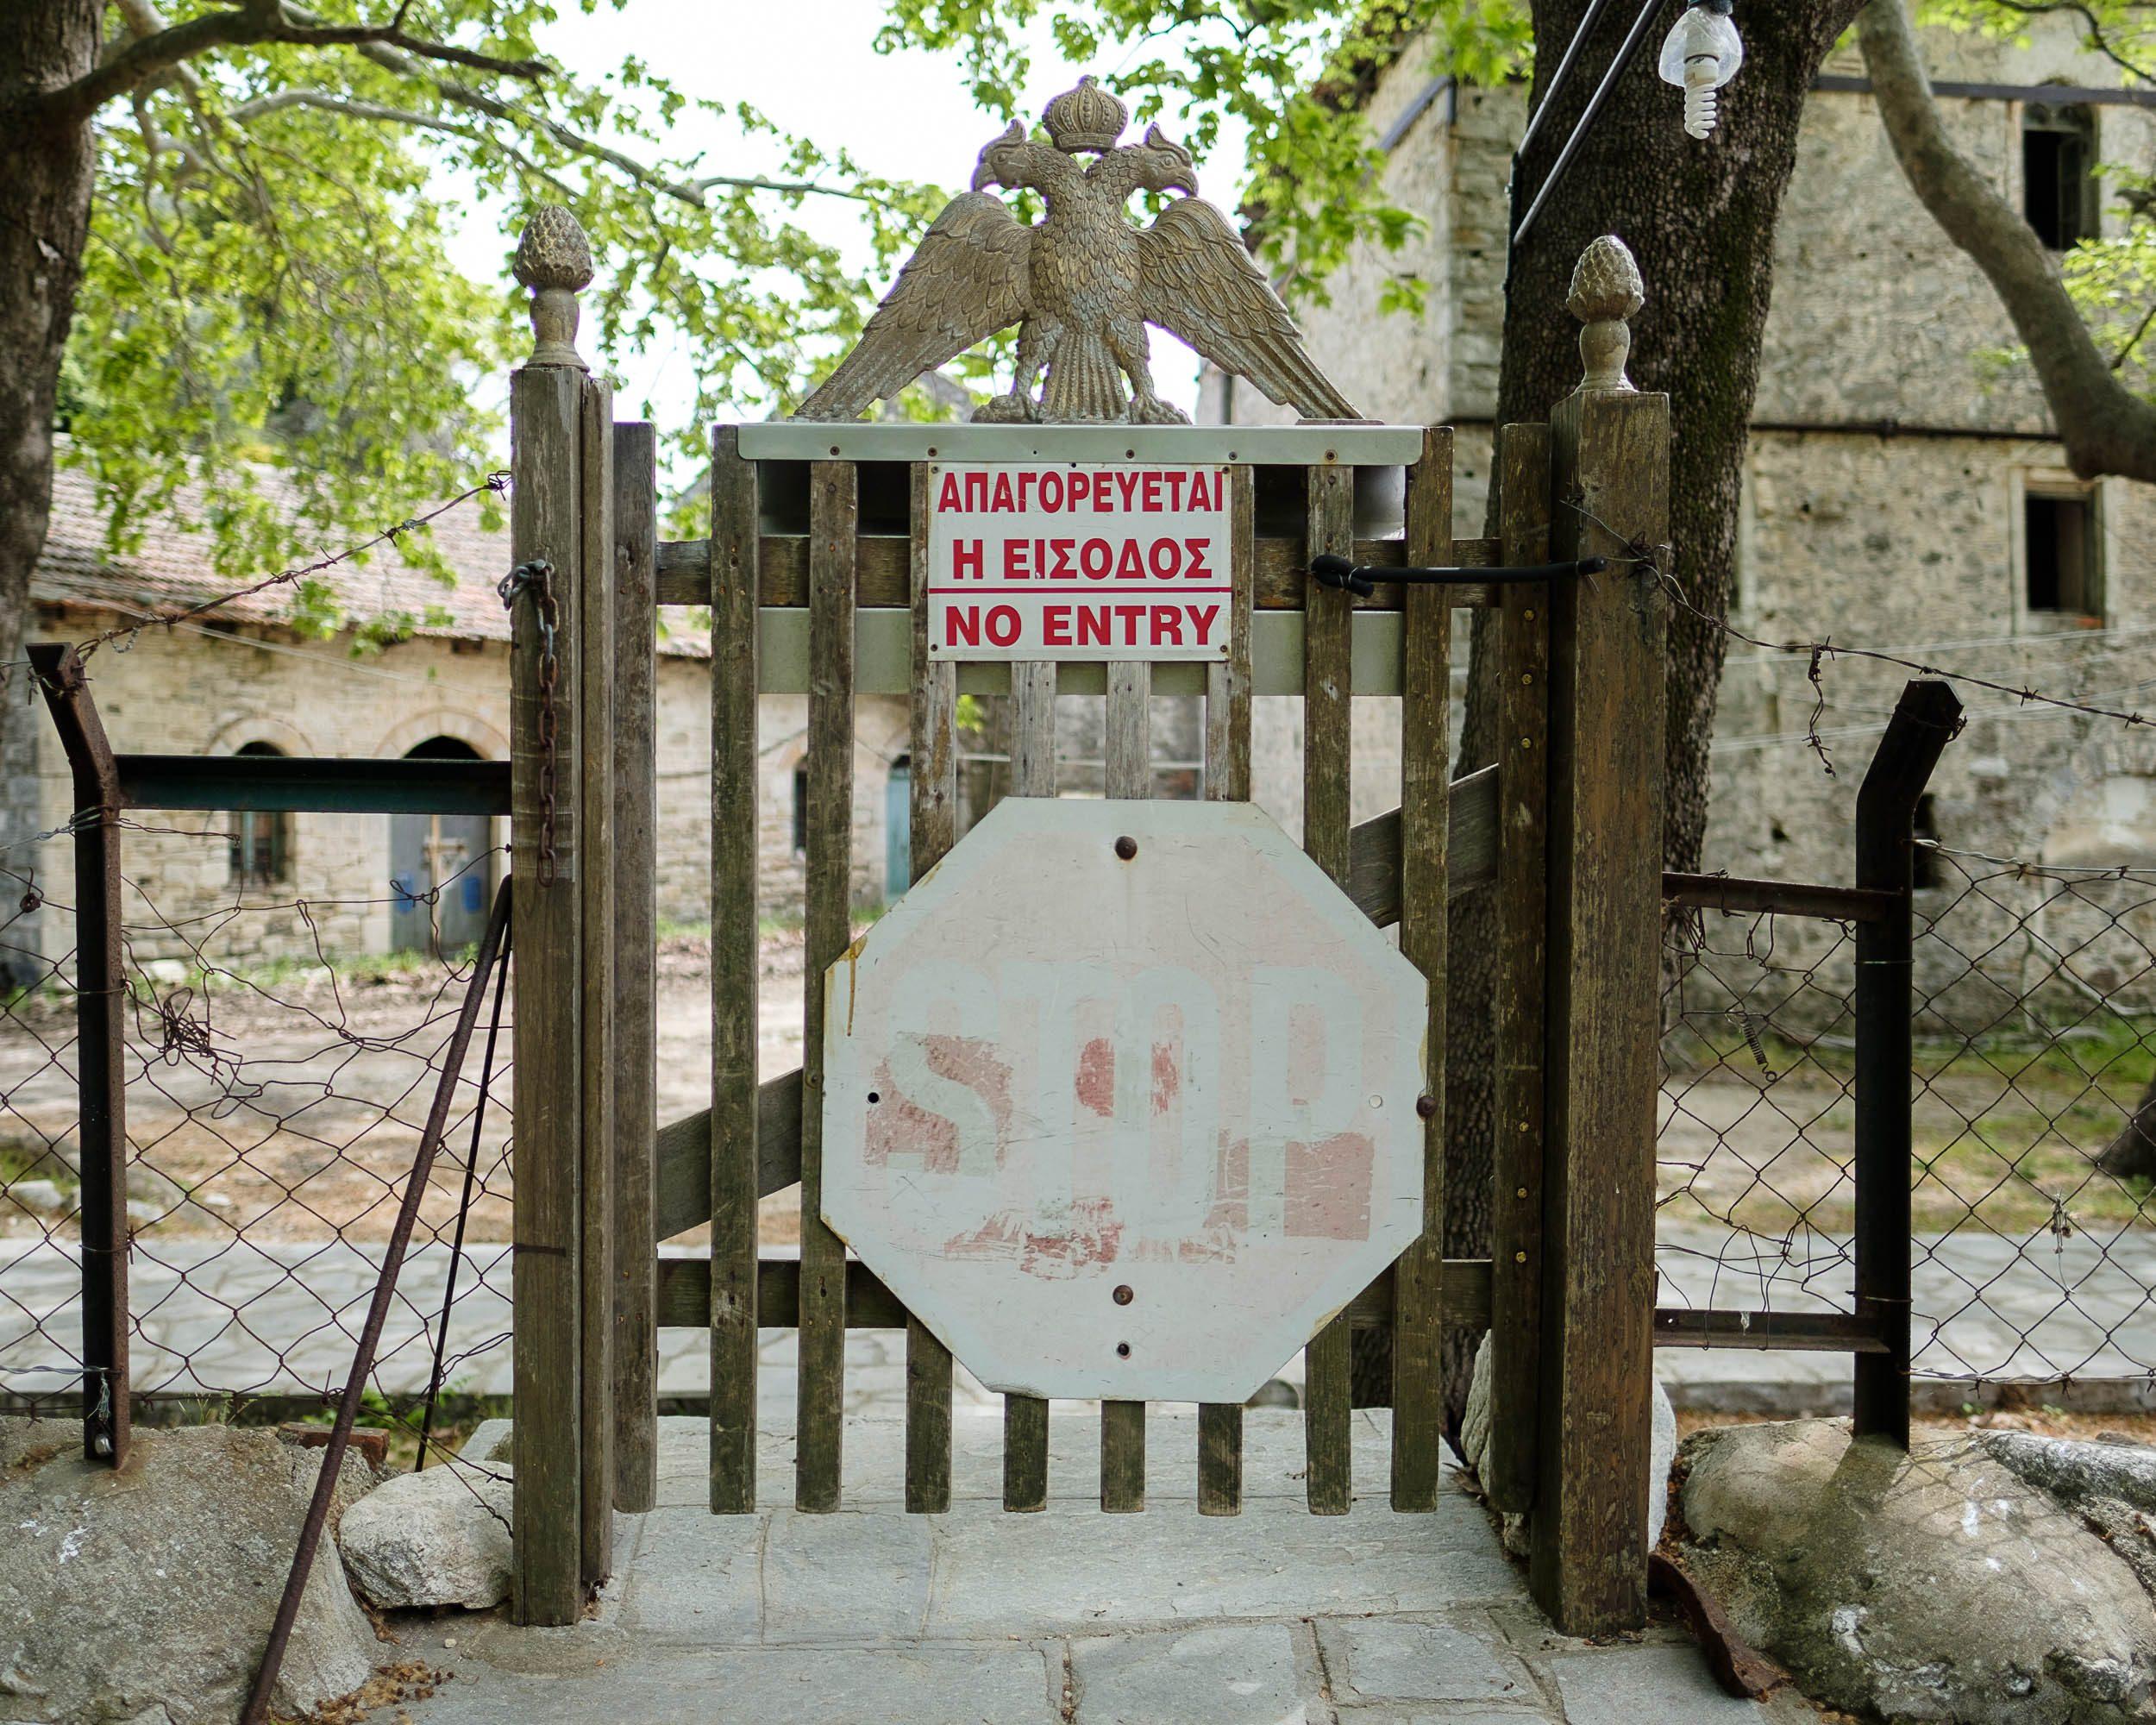 Grenztor Mönchsrepublik Athos, Griechenland, Ägäis